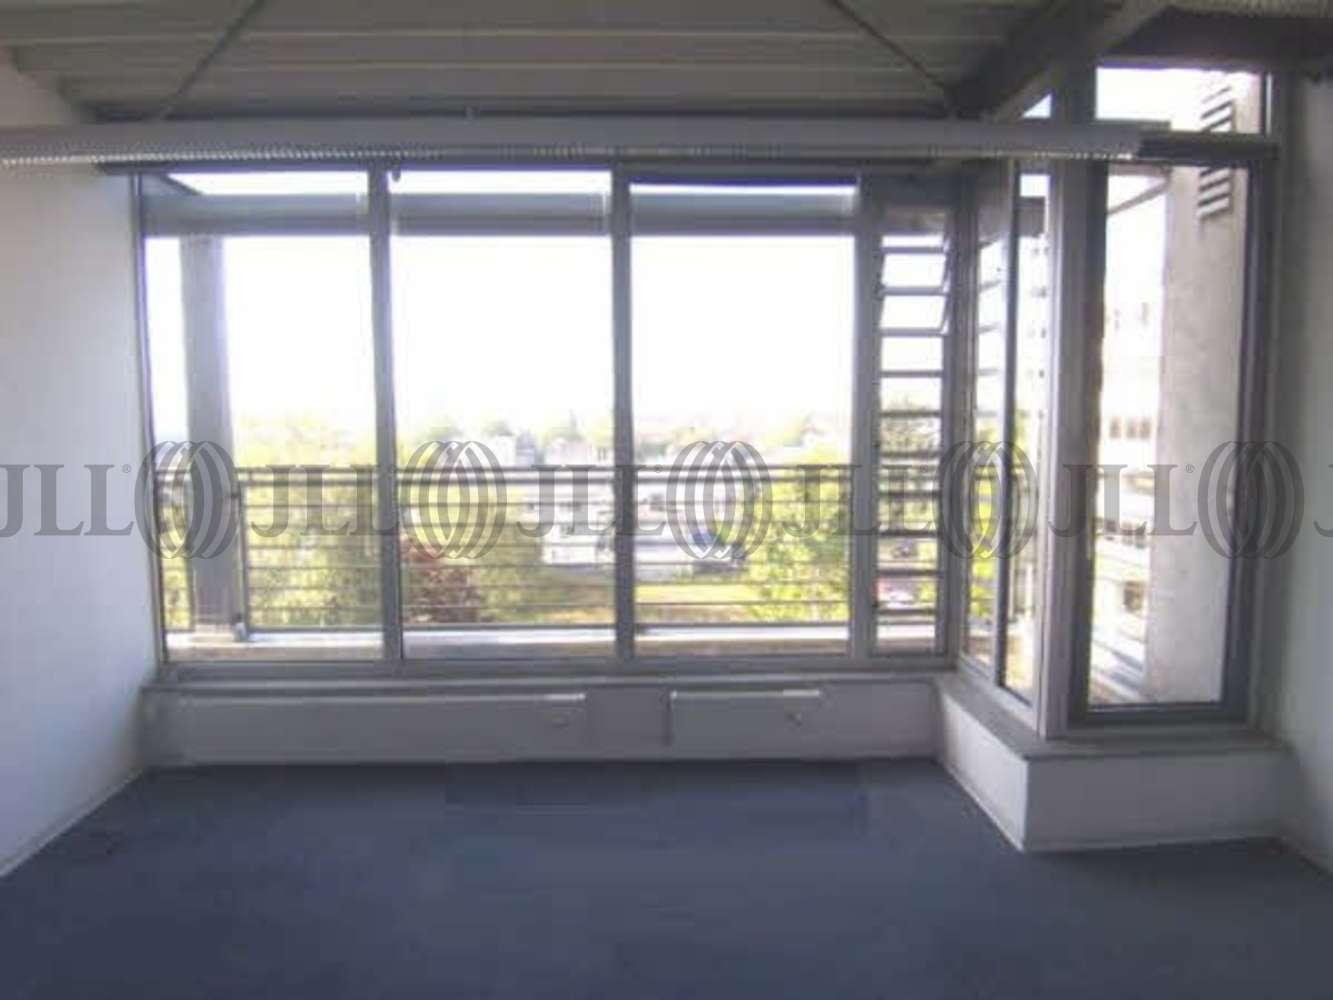 Büros Frankfurt am main, 60388 - Büro - Frankfurt am Main, Bergen-Enkheim - F2175 - 10804463